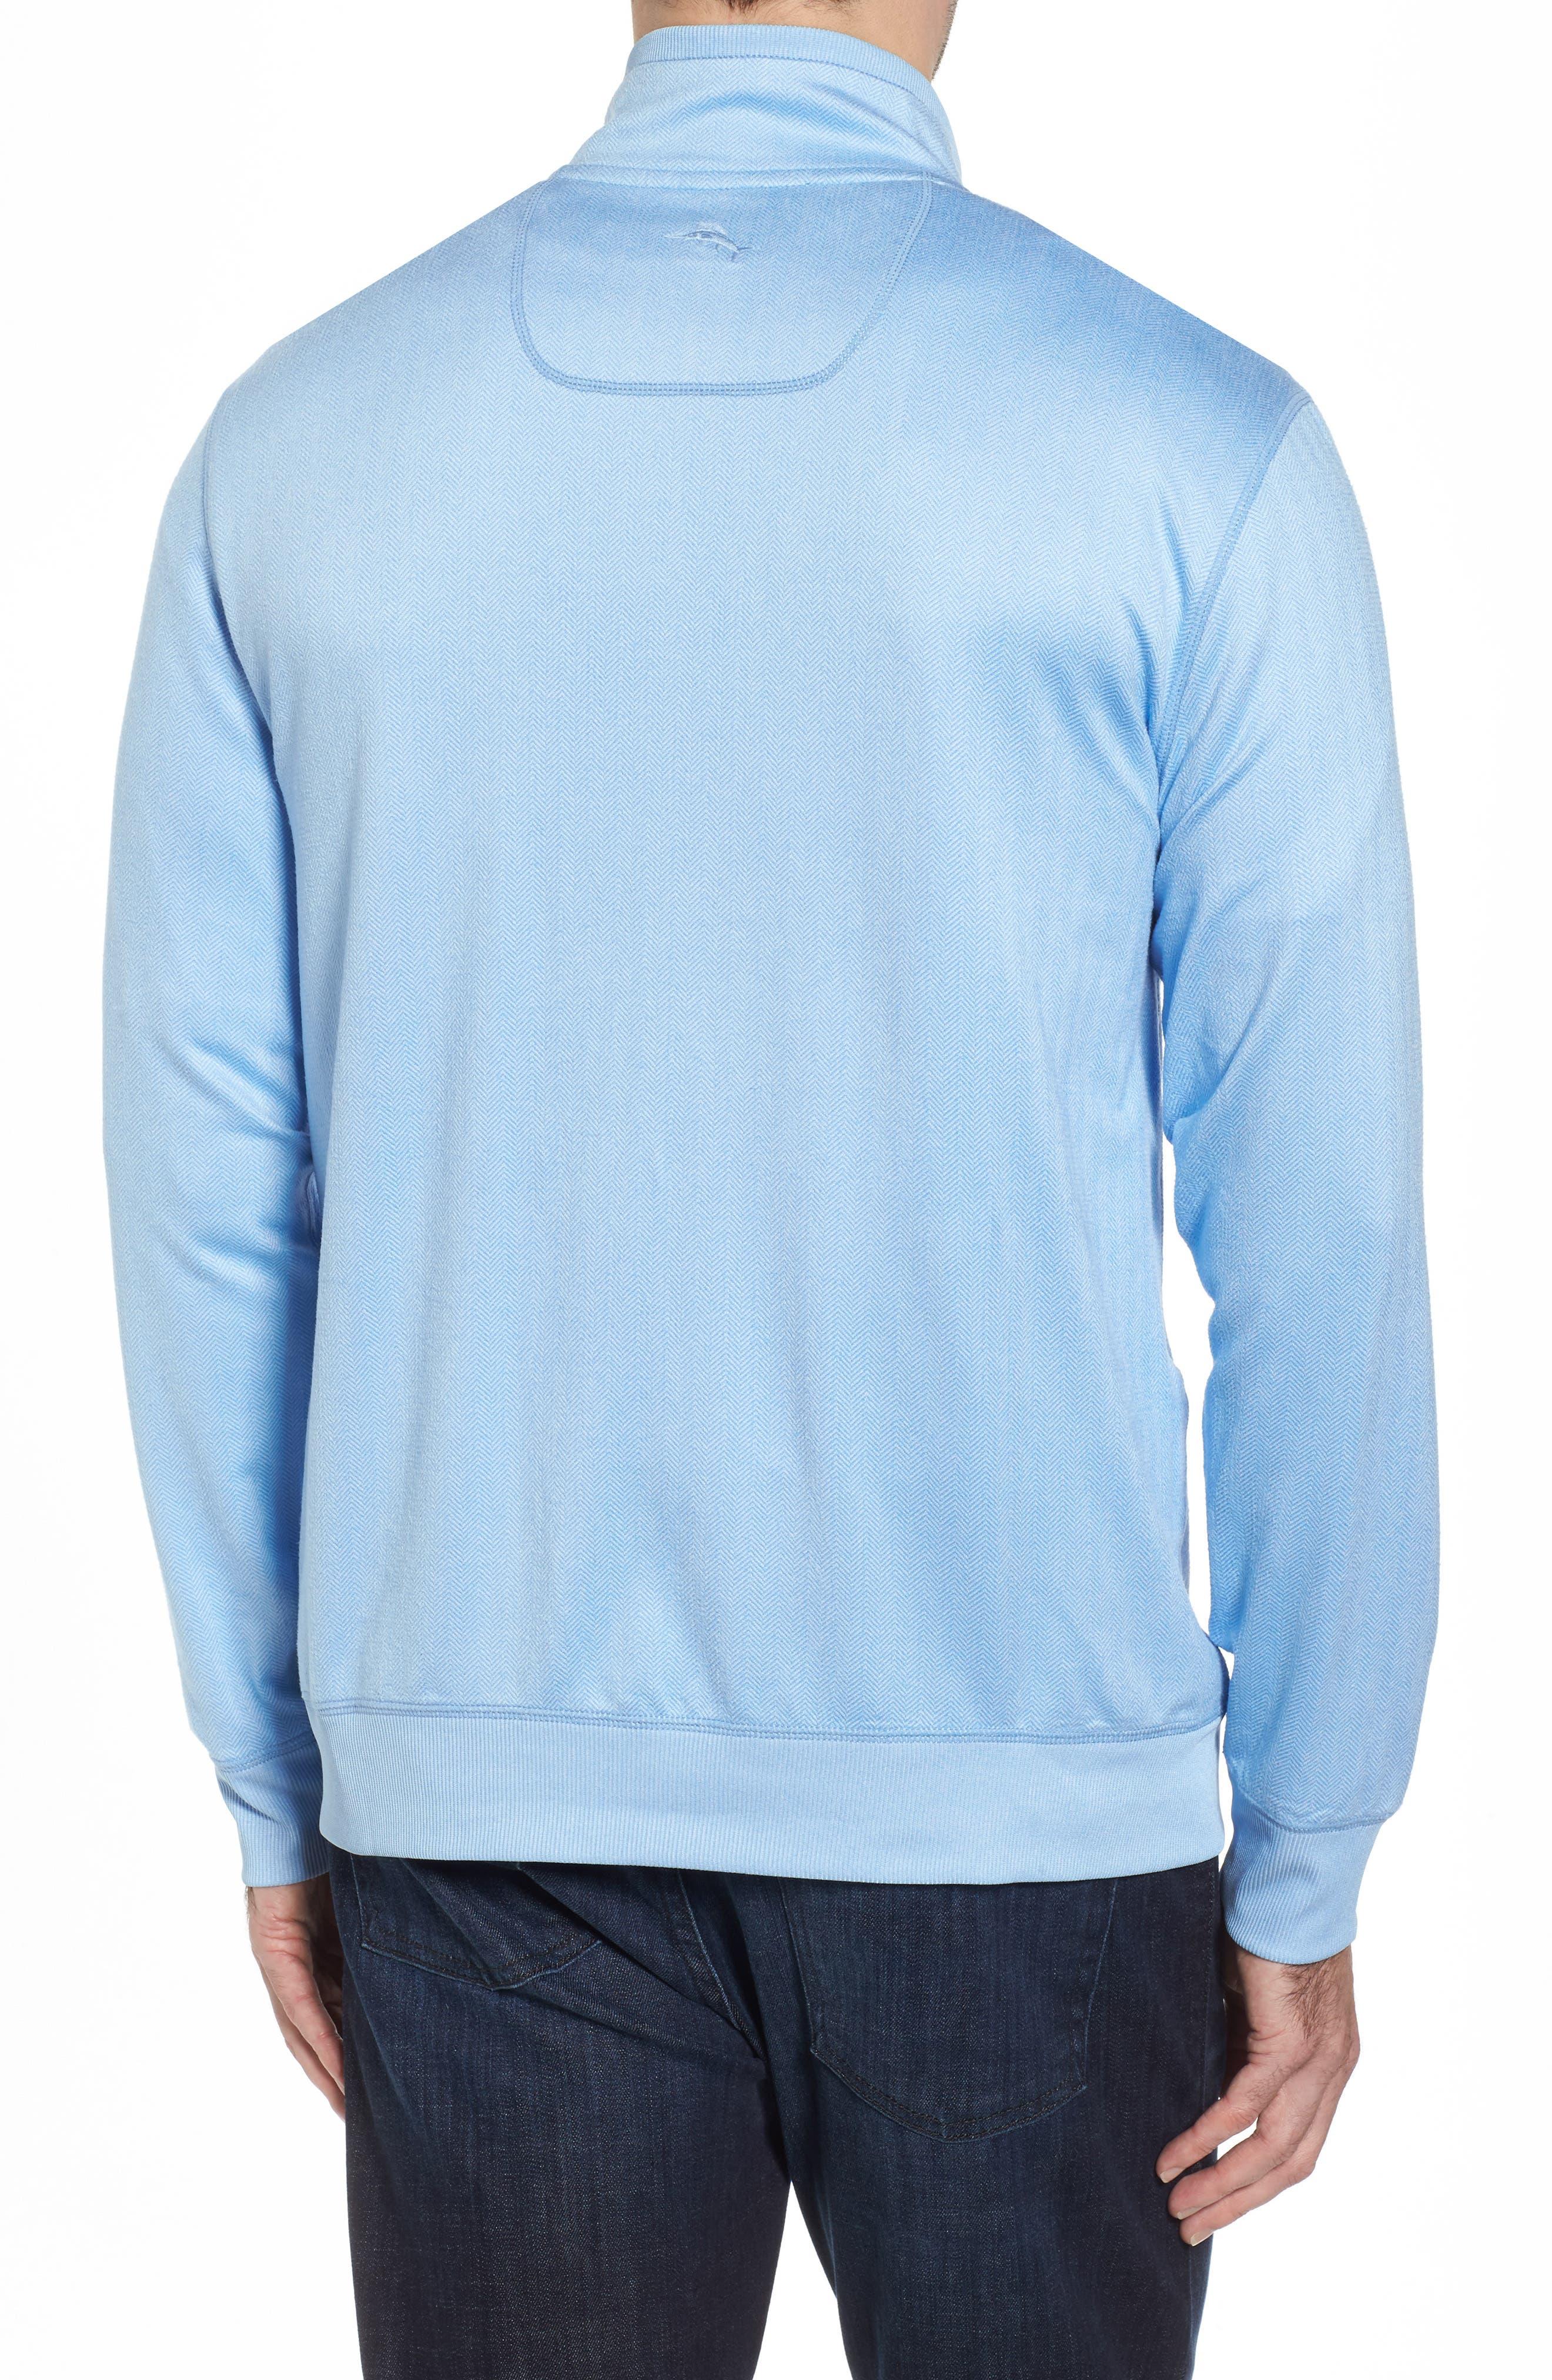 Alternate Image 2  - Tommy Bahama Pro Formance Quarter Zip Sweater